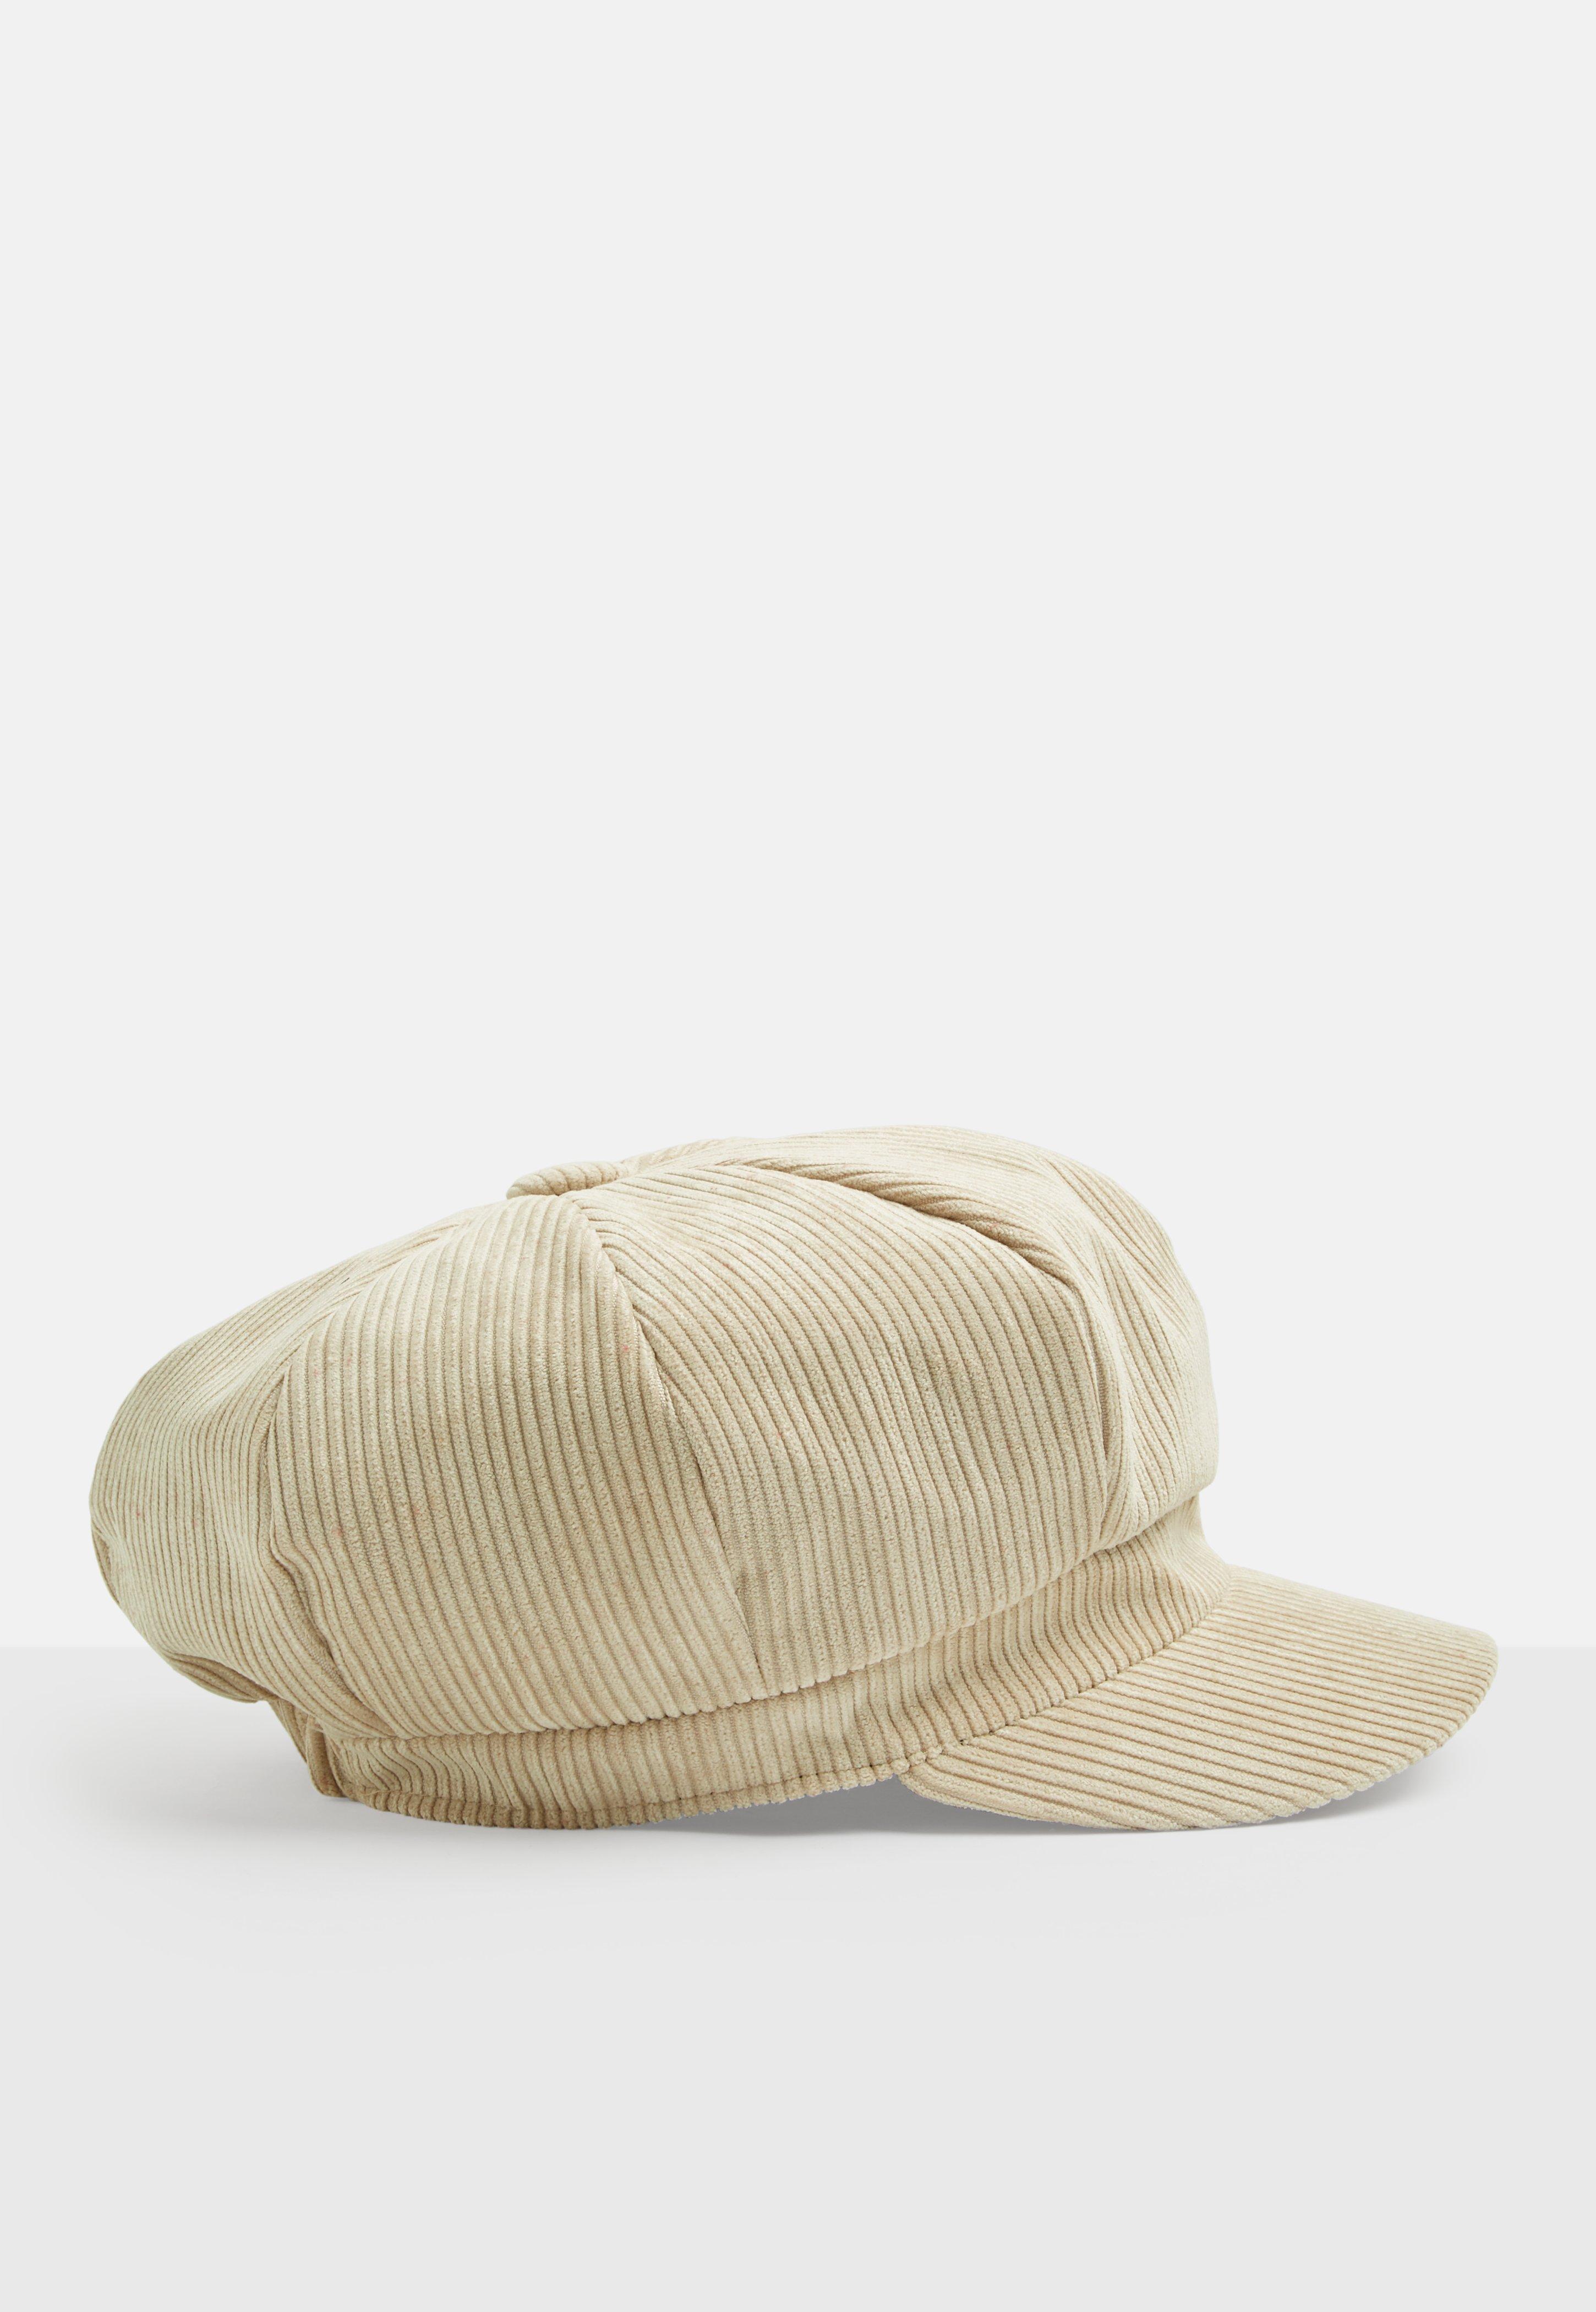 Lyst - Missguided Cream Corduroy Baker Boy Hat e1703a55d02